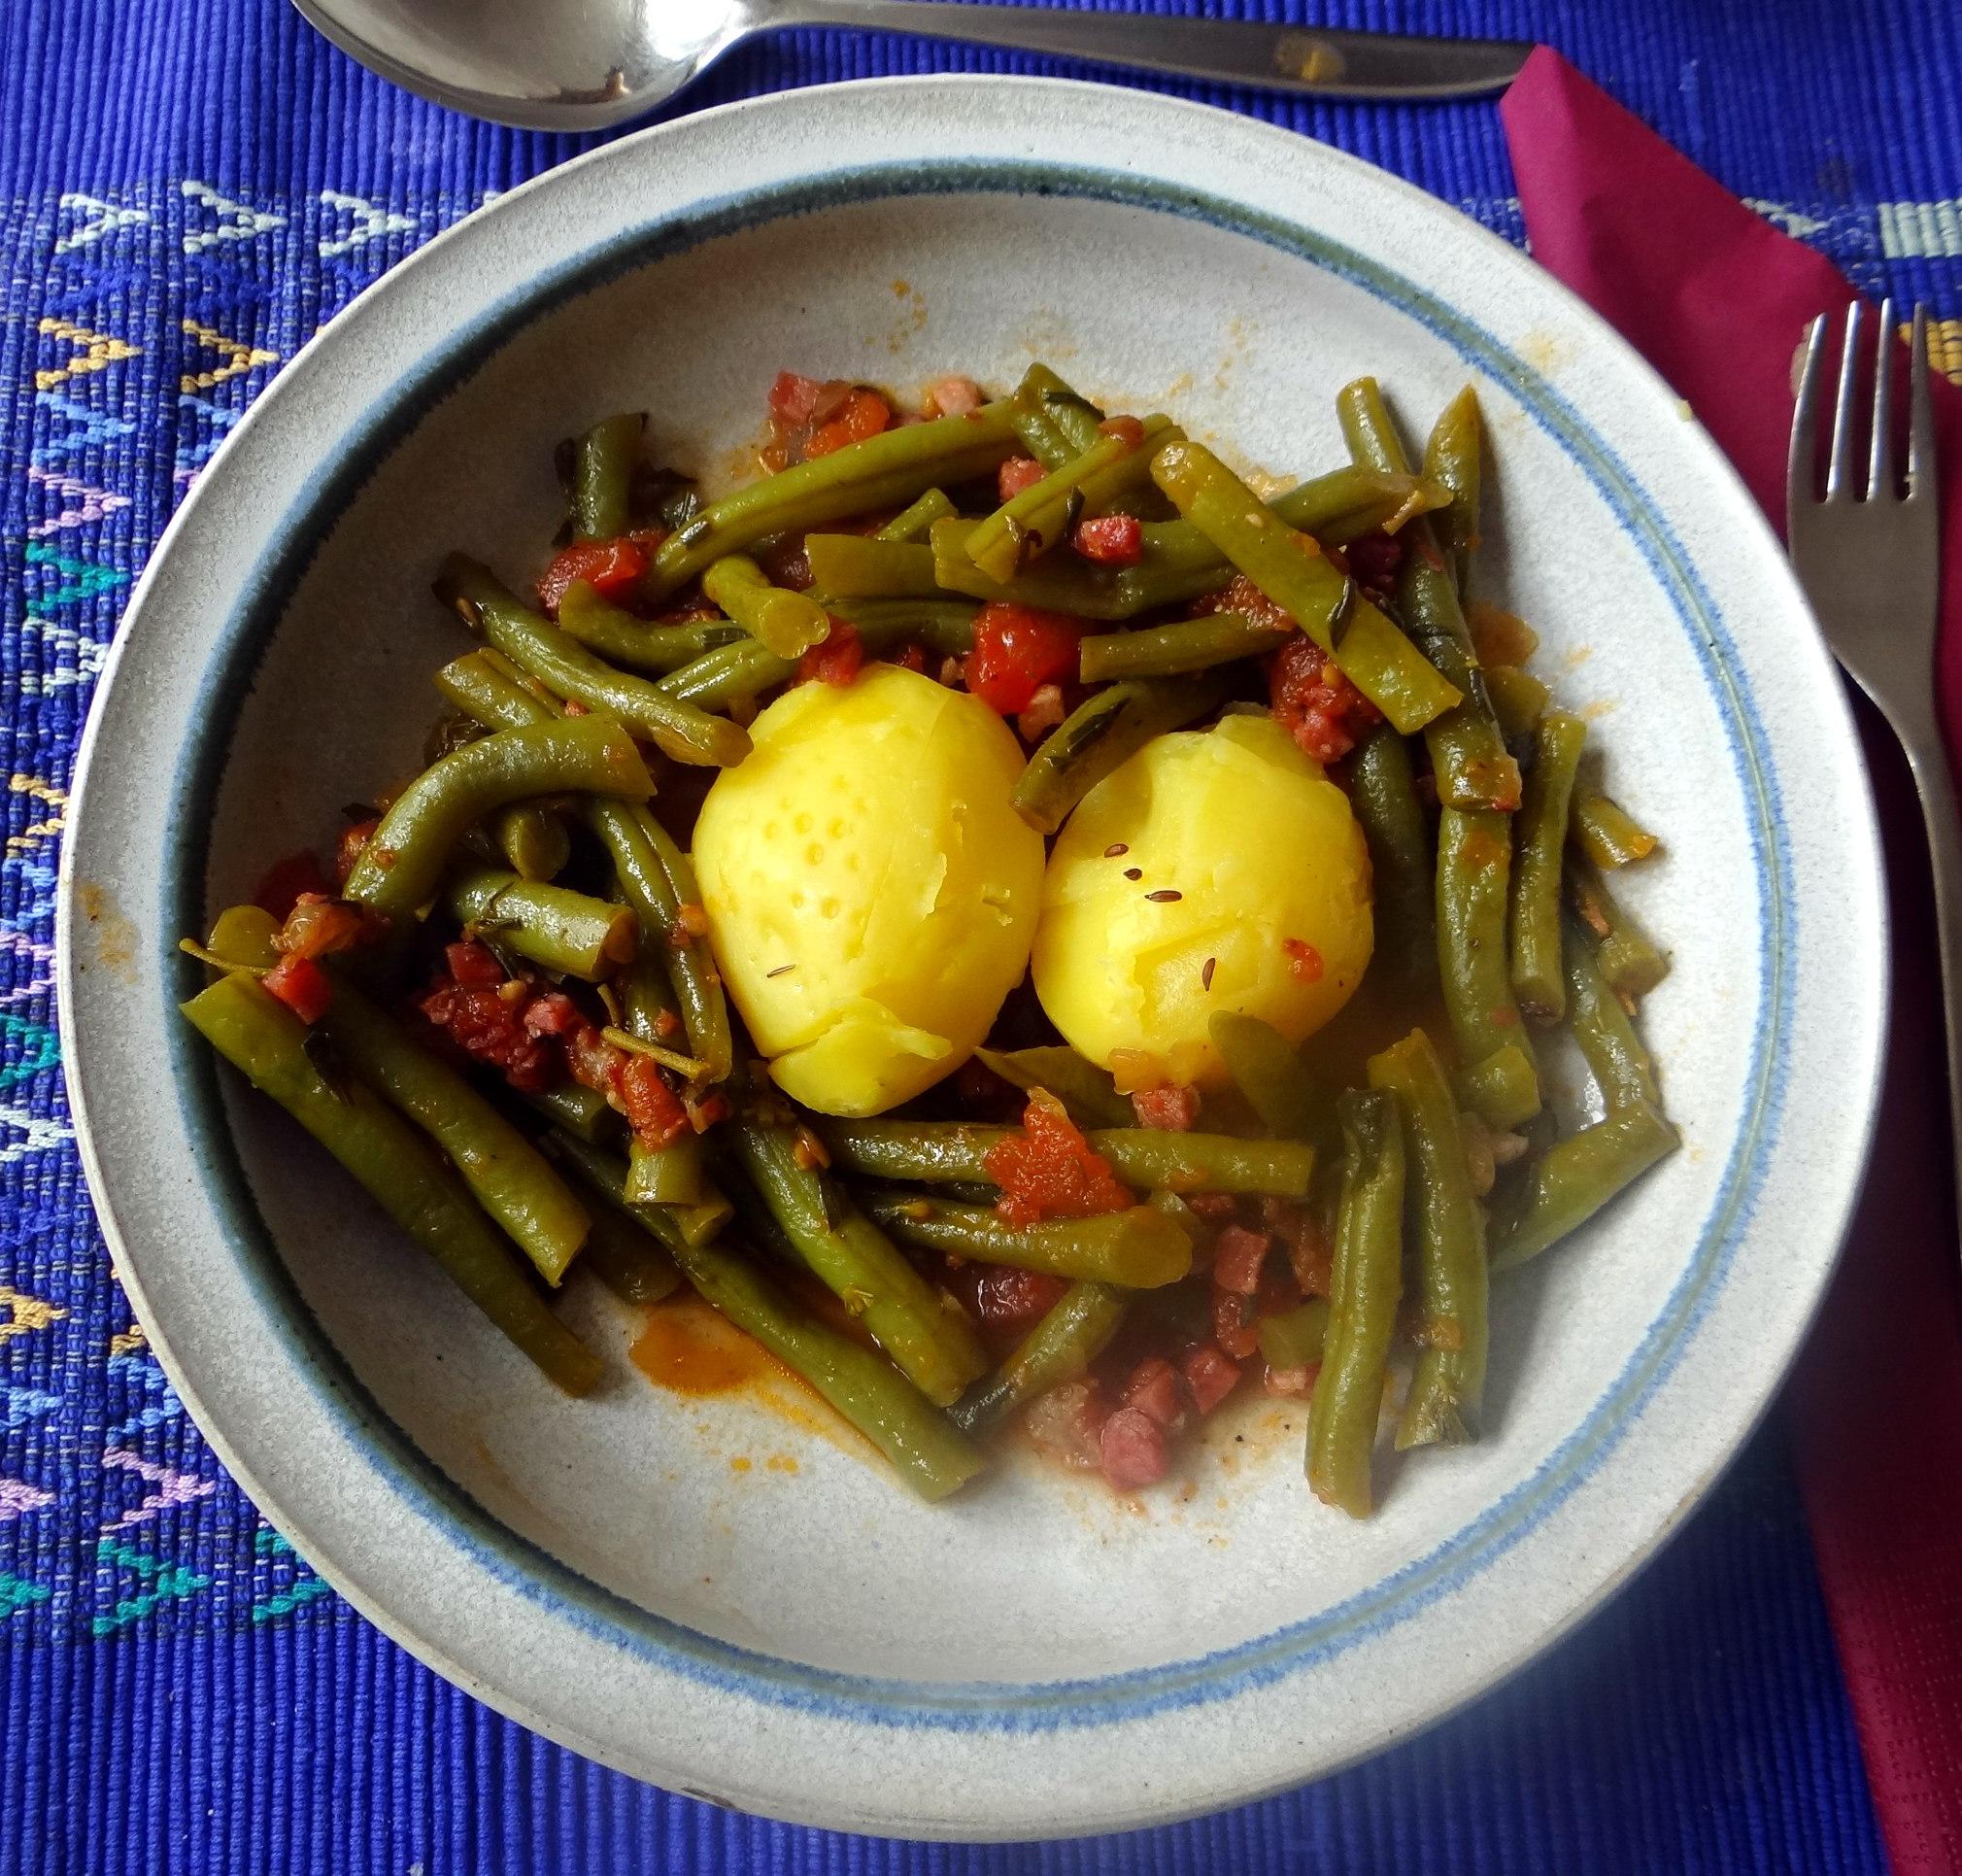 Bohnengemüse,Pellkartoffeln,Obstsalat (1)